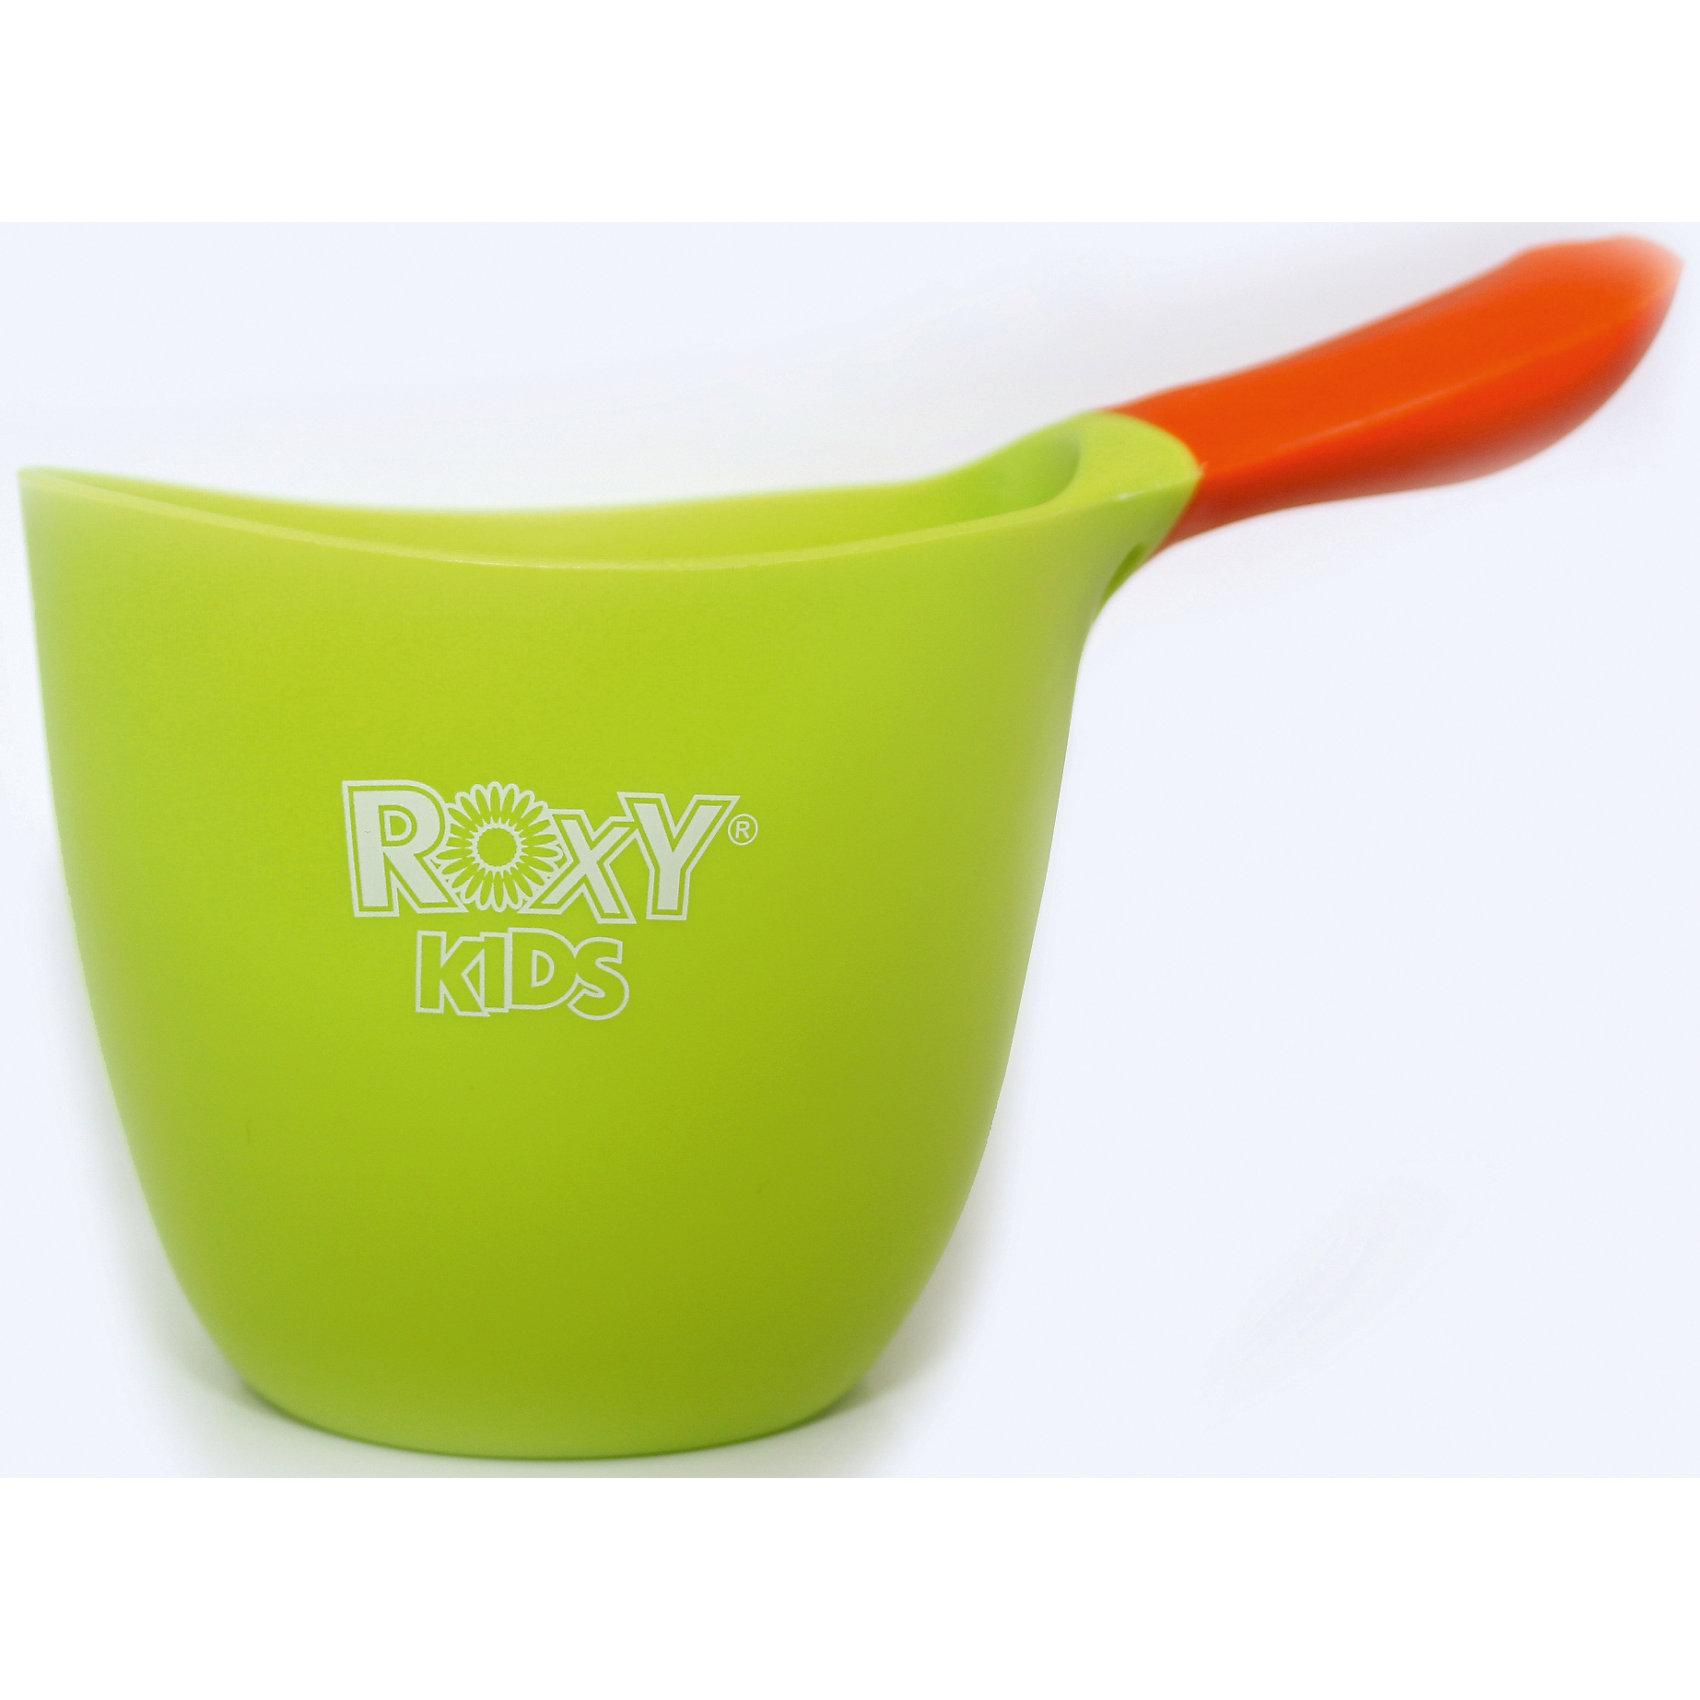 Ковшик для ванны, Roxy-kids, зеленый (Roxy-Kids)